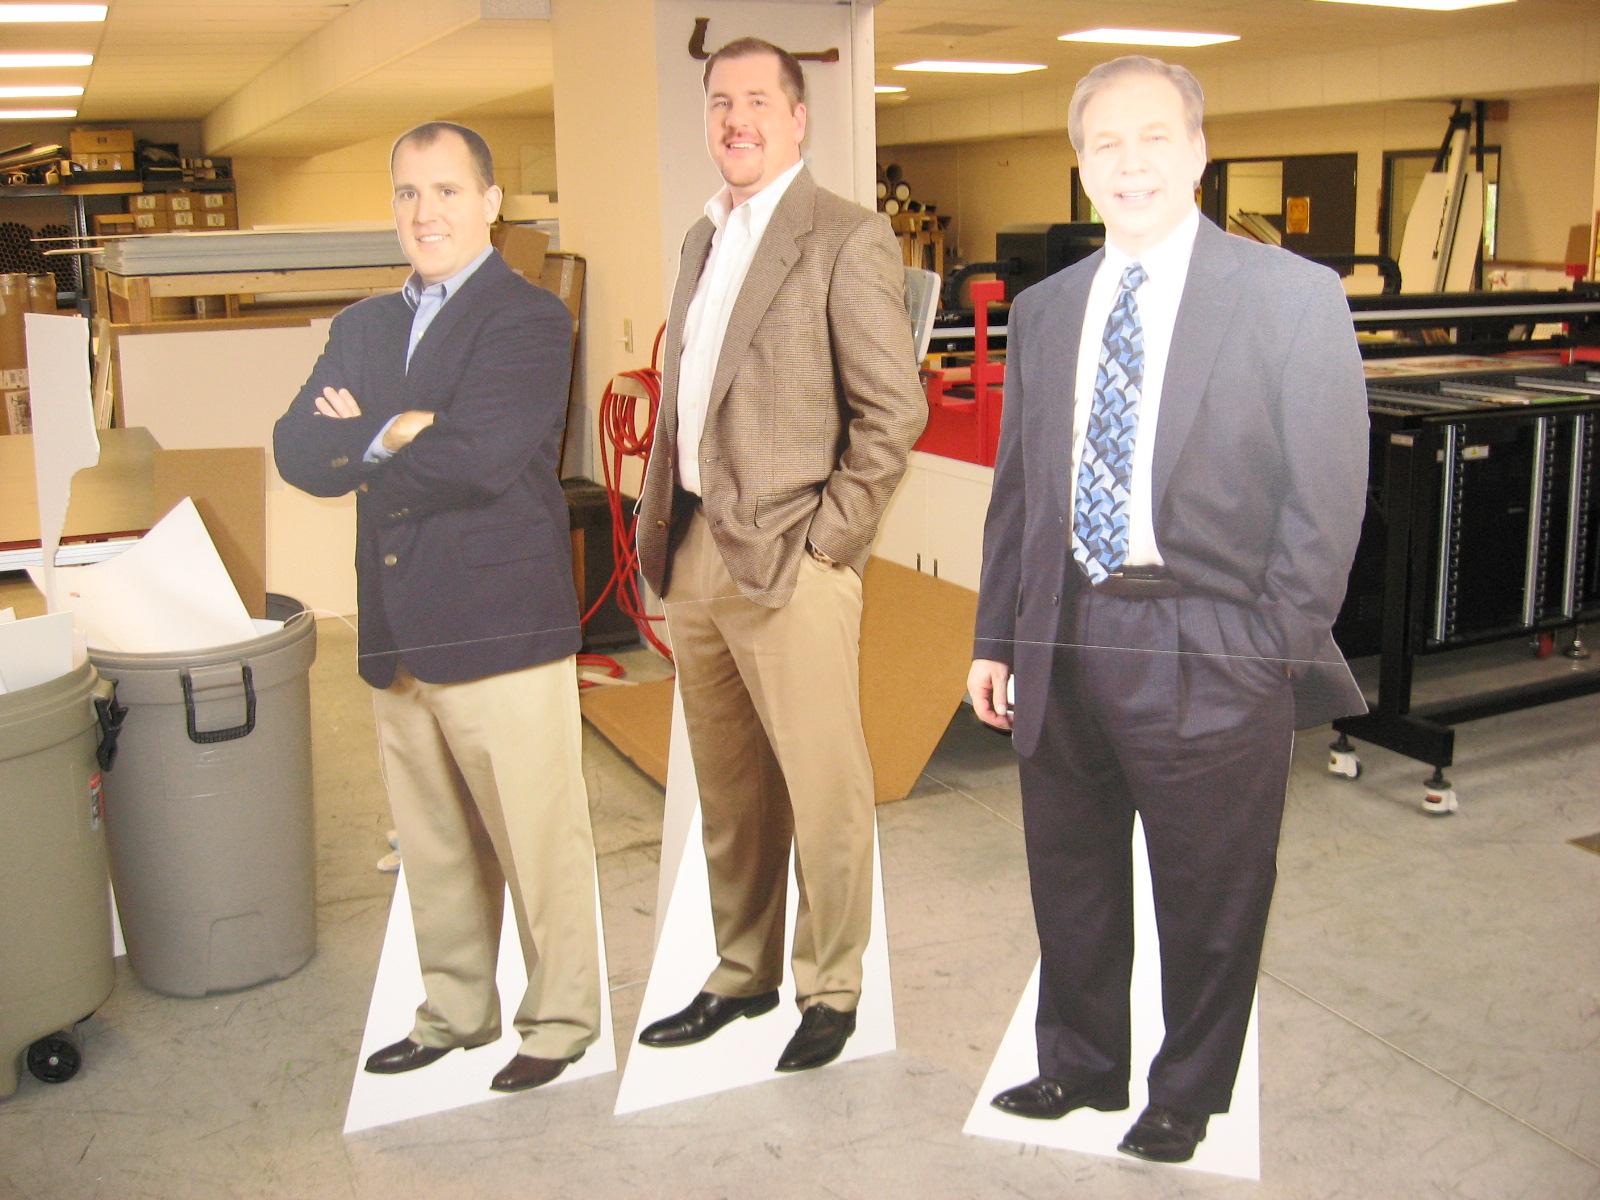 Cardboard Cutouts of People | megaprintinc